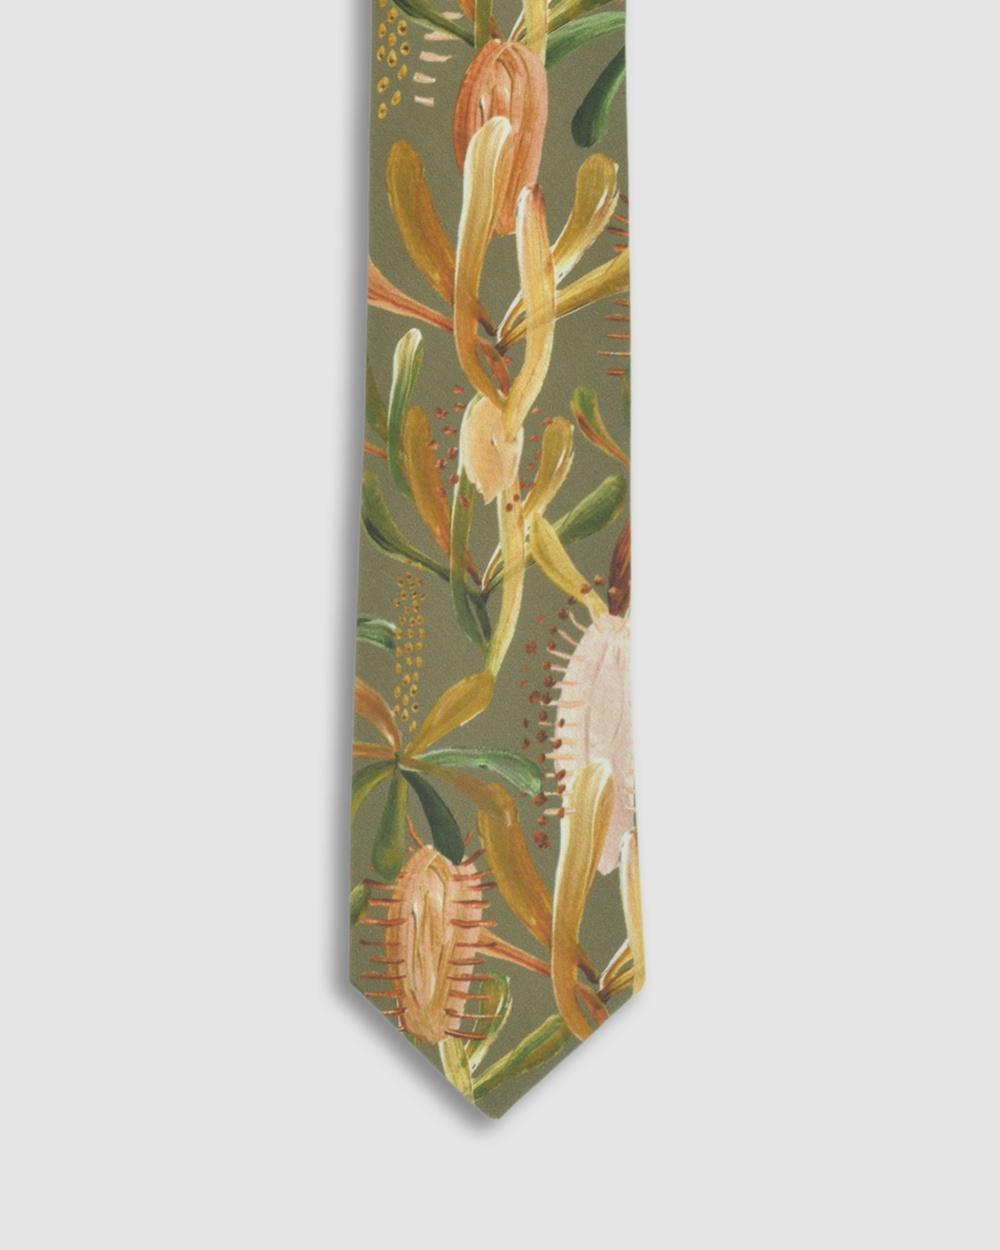 Peggy and Finn Grass Tree Tie Ties Sage Australia